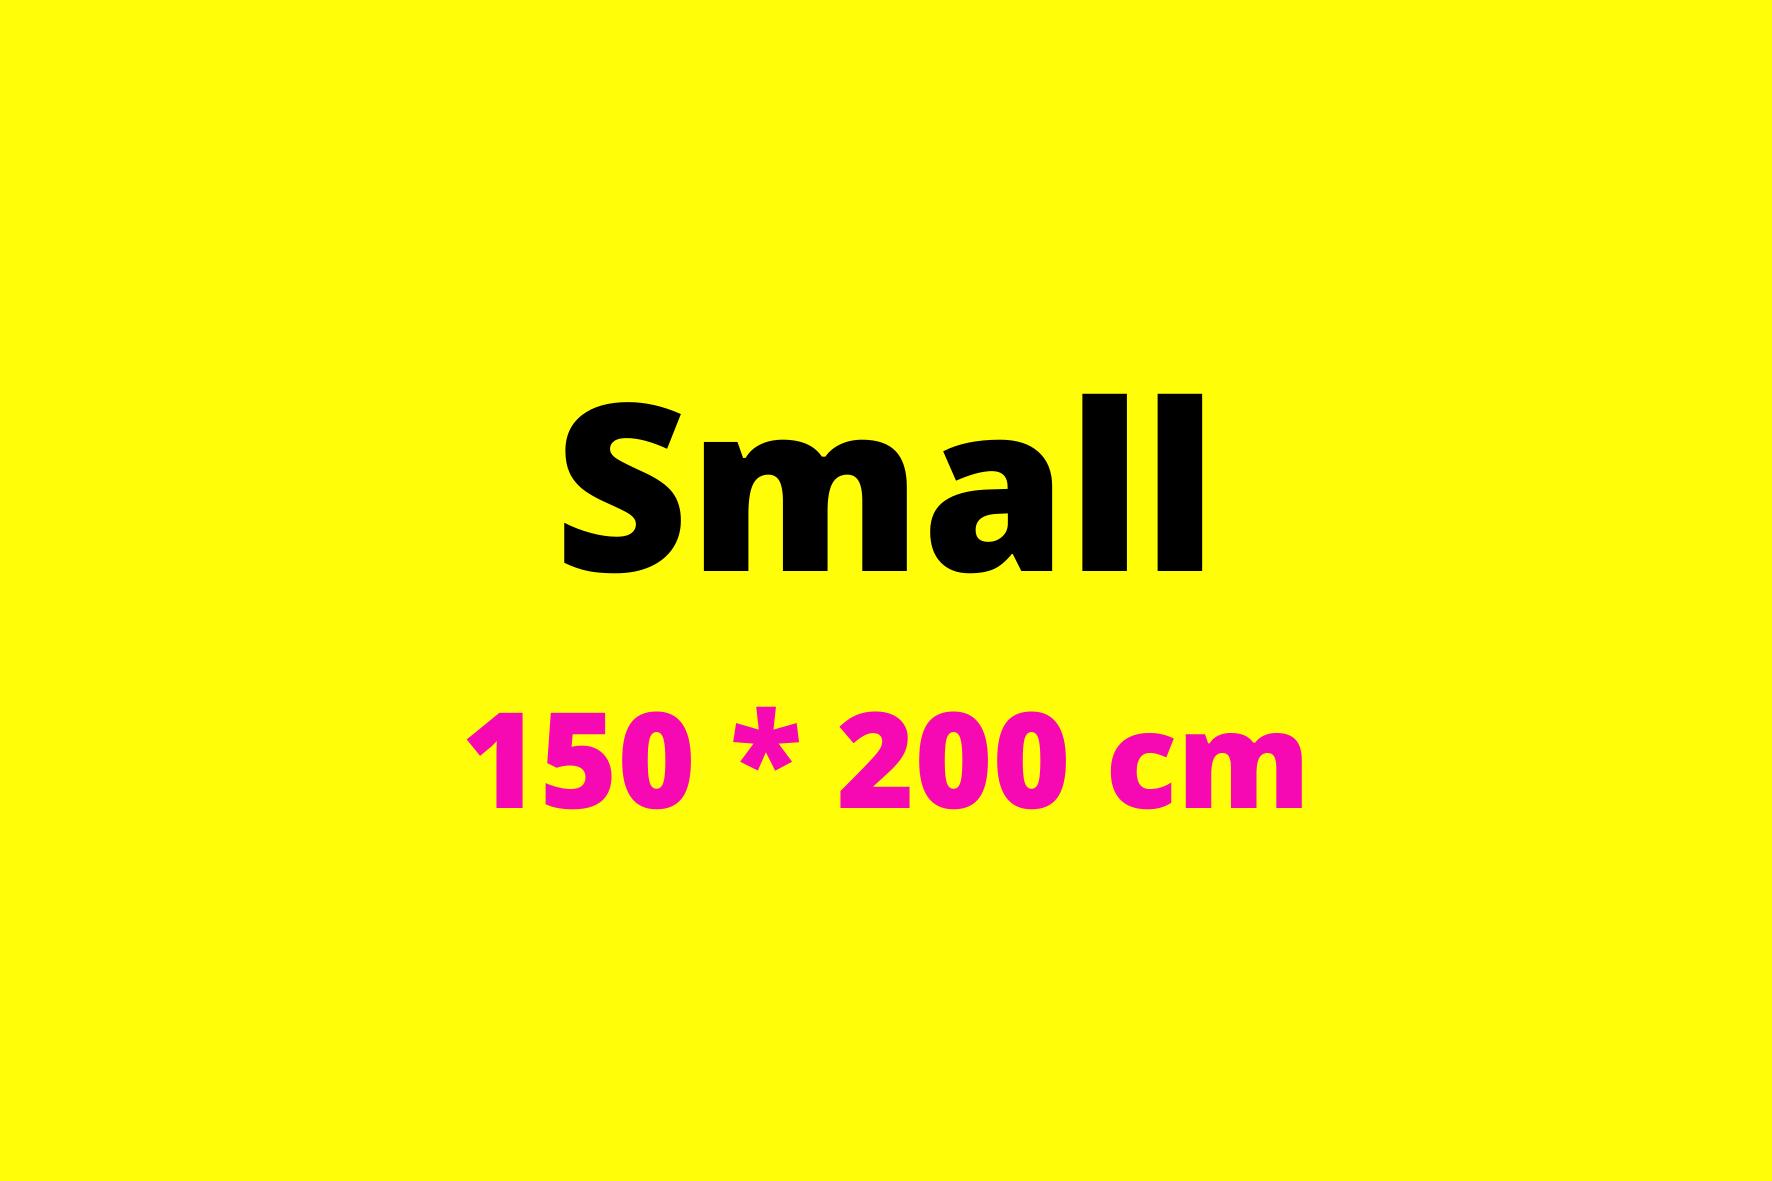 150*200 cm